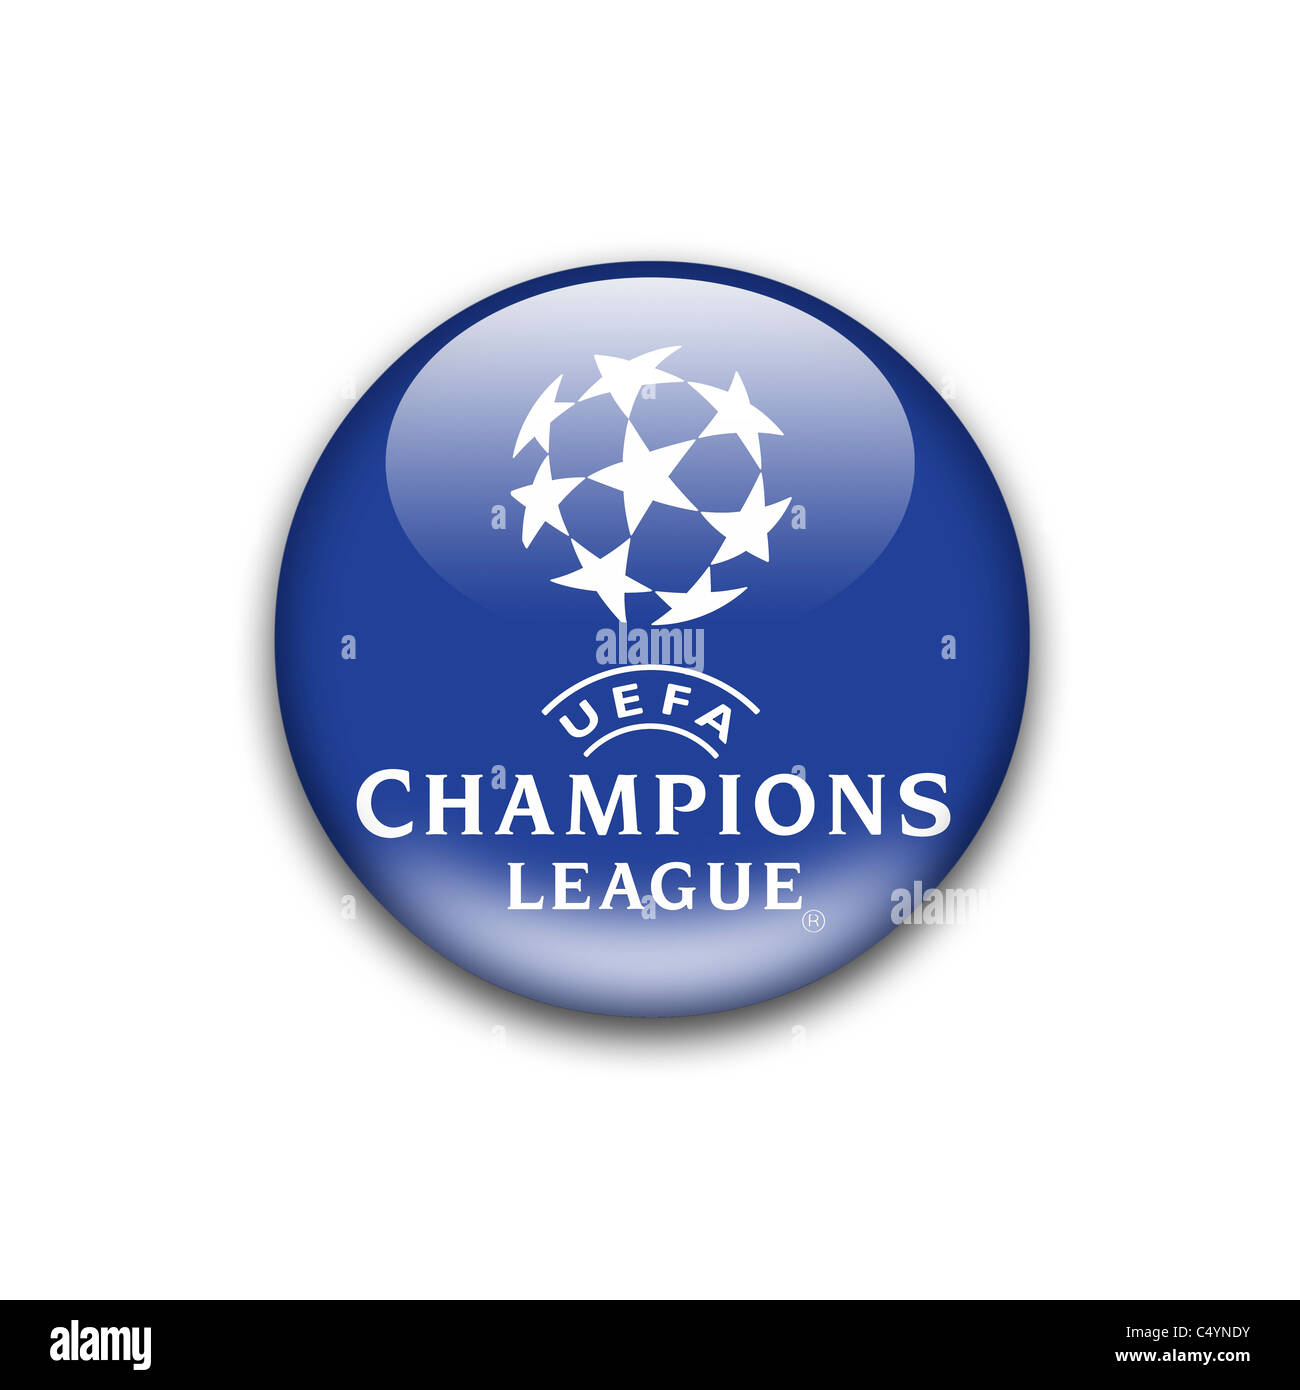 Champions League Uefa Logo Flag Symbol Icon Stock Photo Alamy